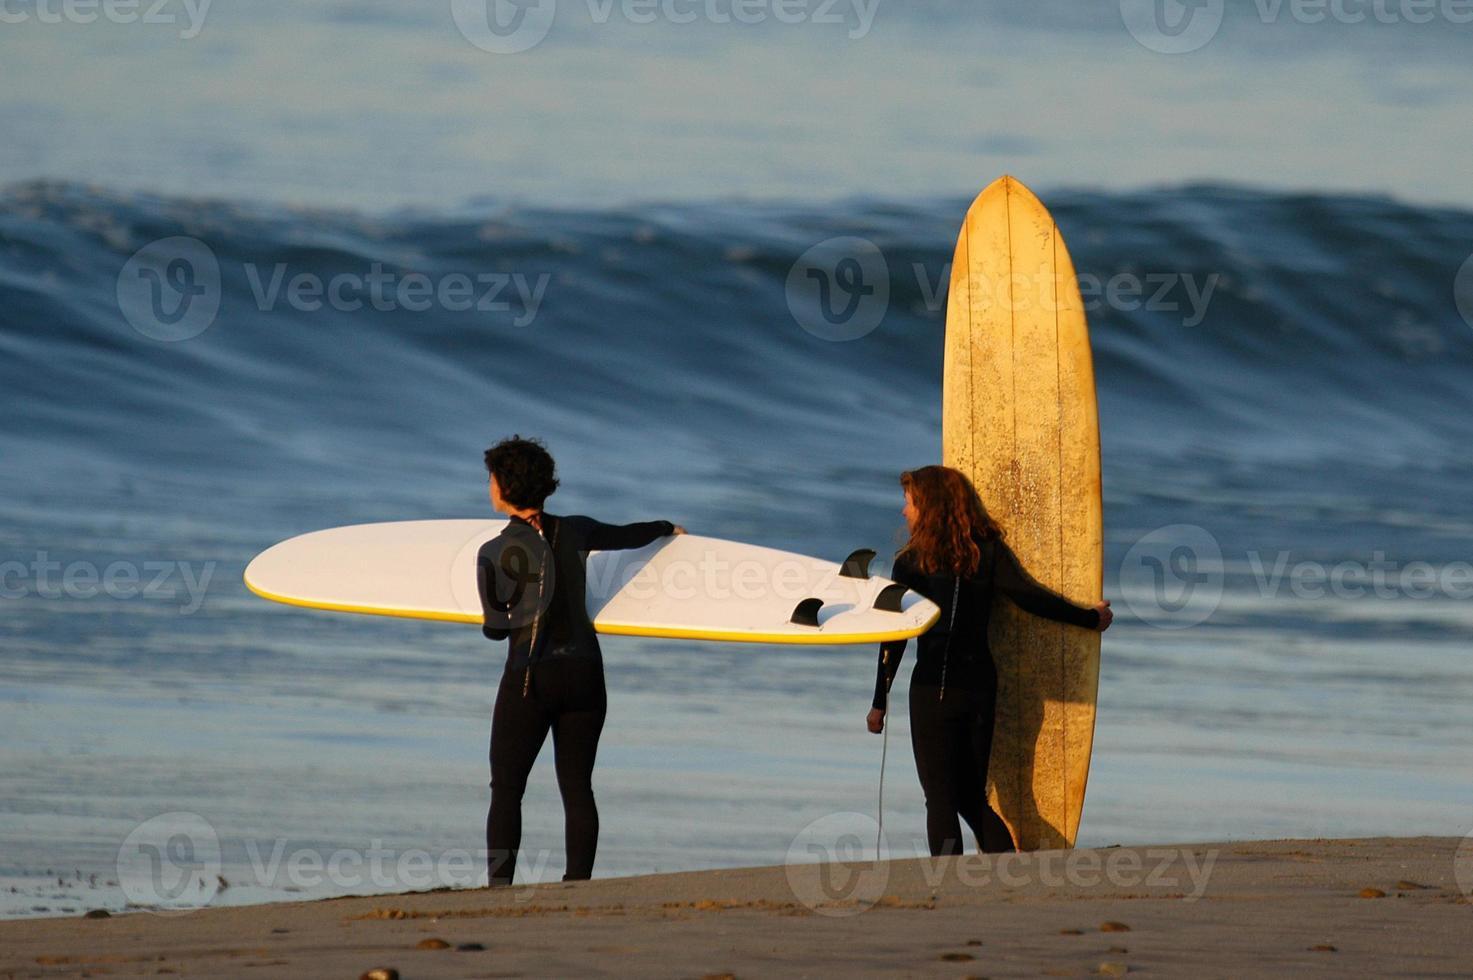 chicas surfistas de california foto